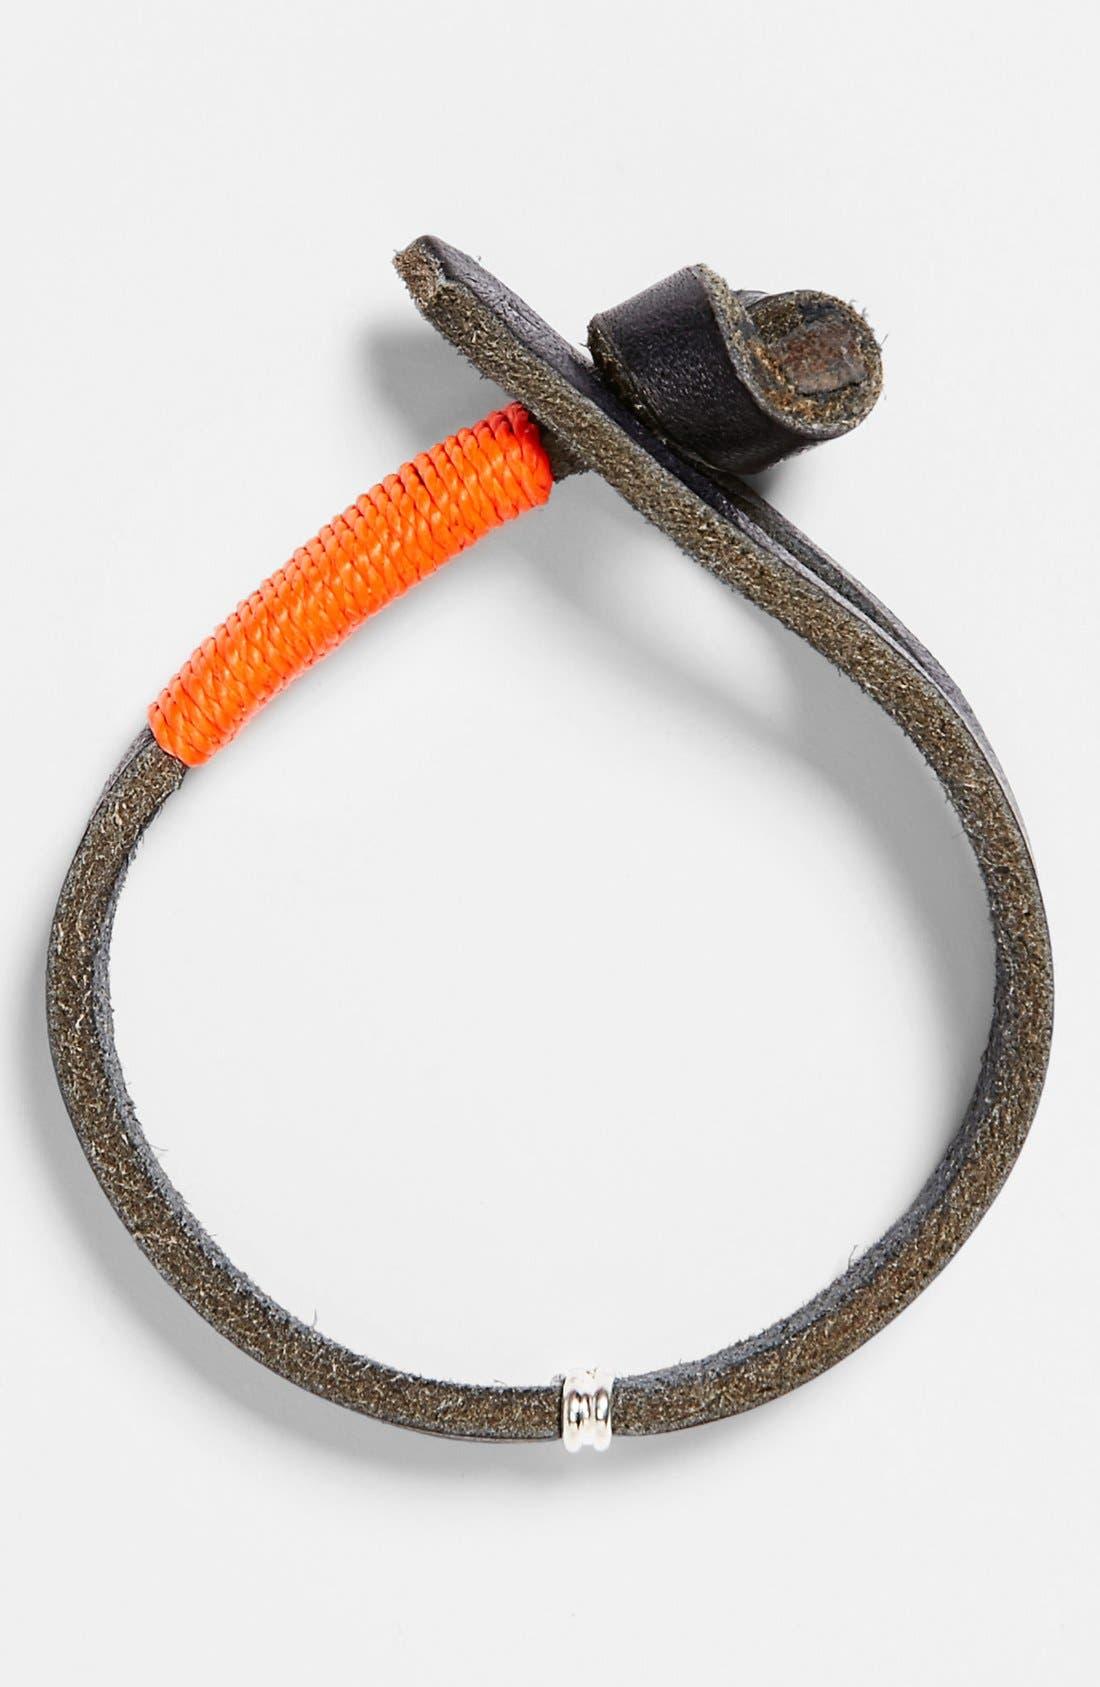 Main Image - CAPUTO & CO Knot & Loop Leather Bracelet